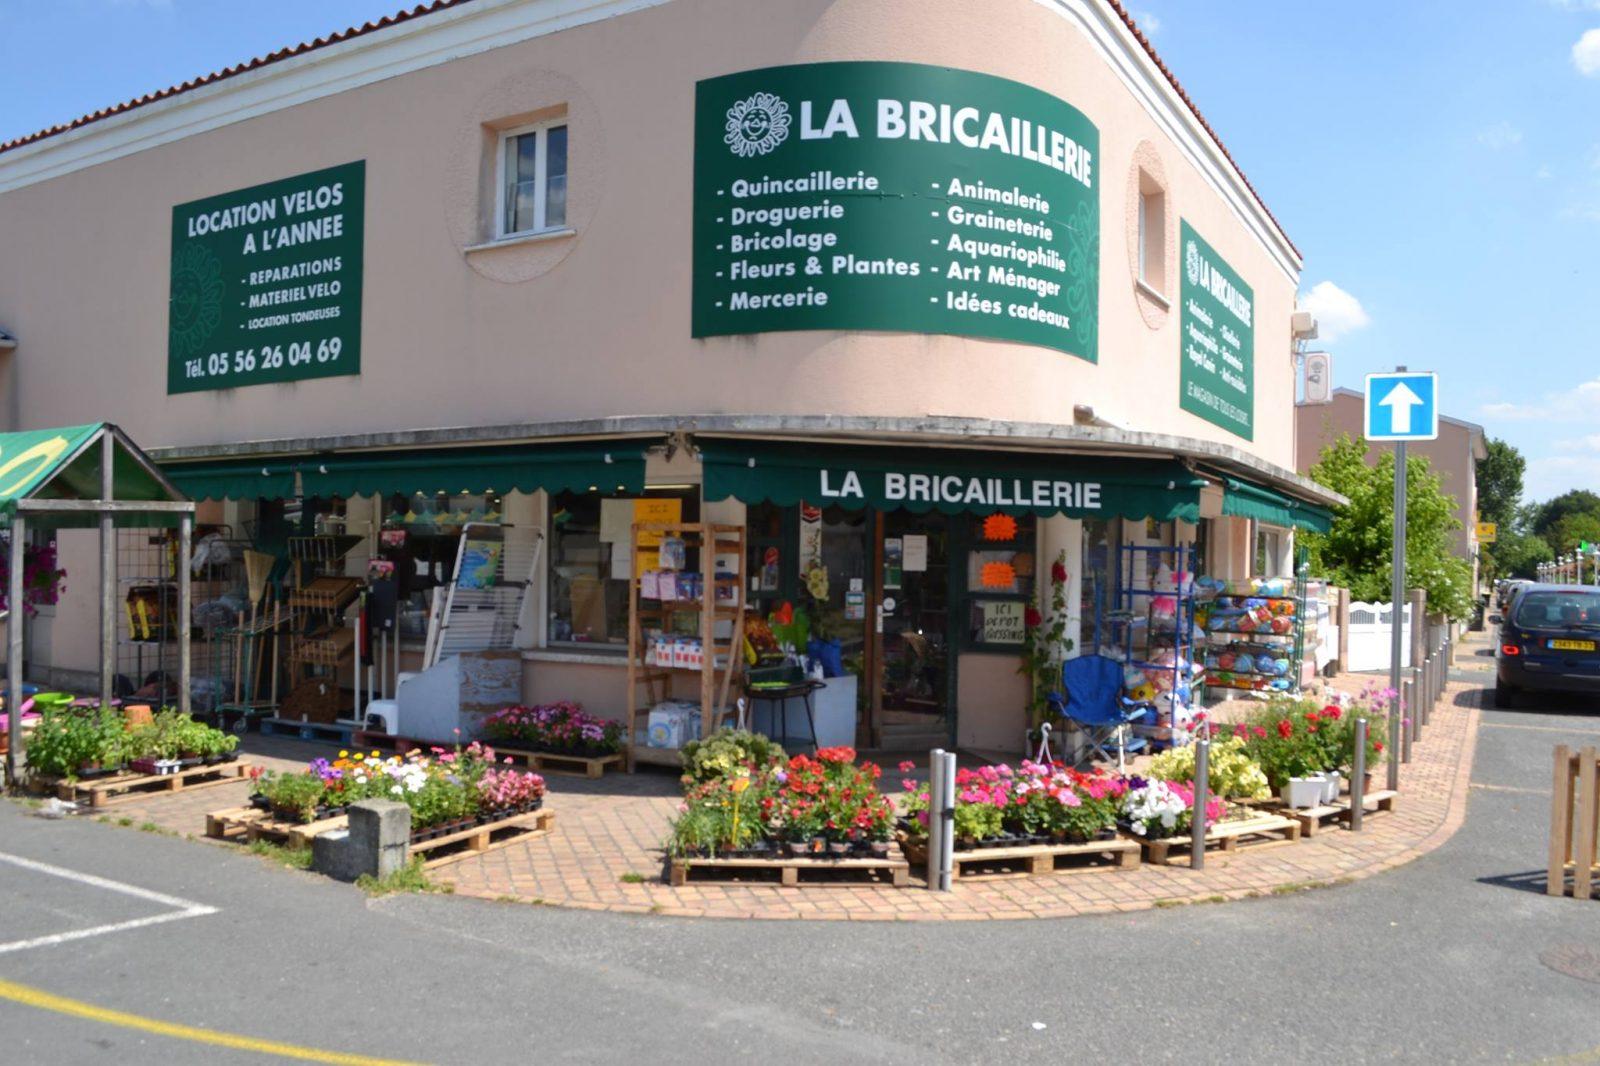 La Bricaillerie